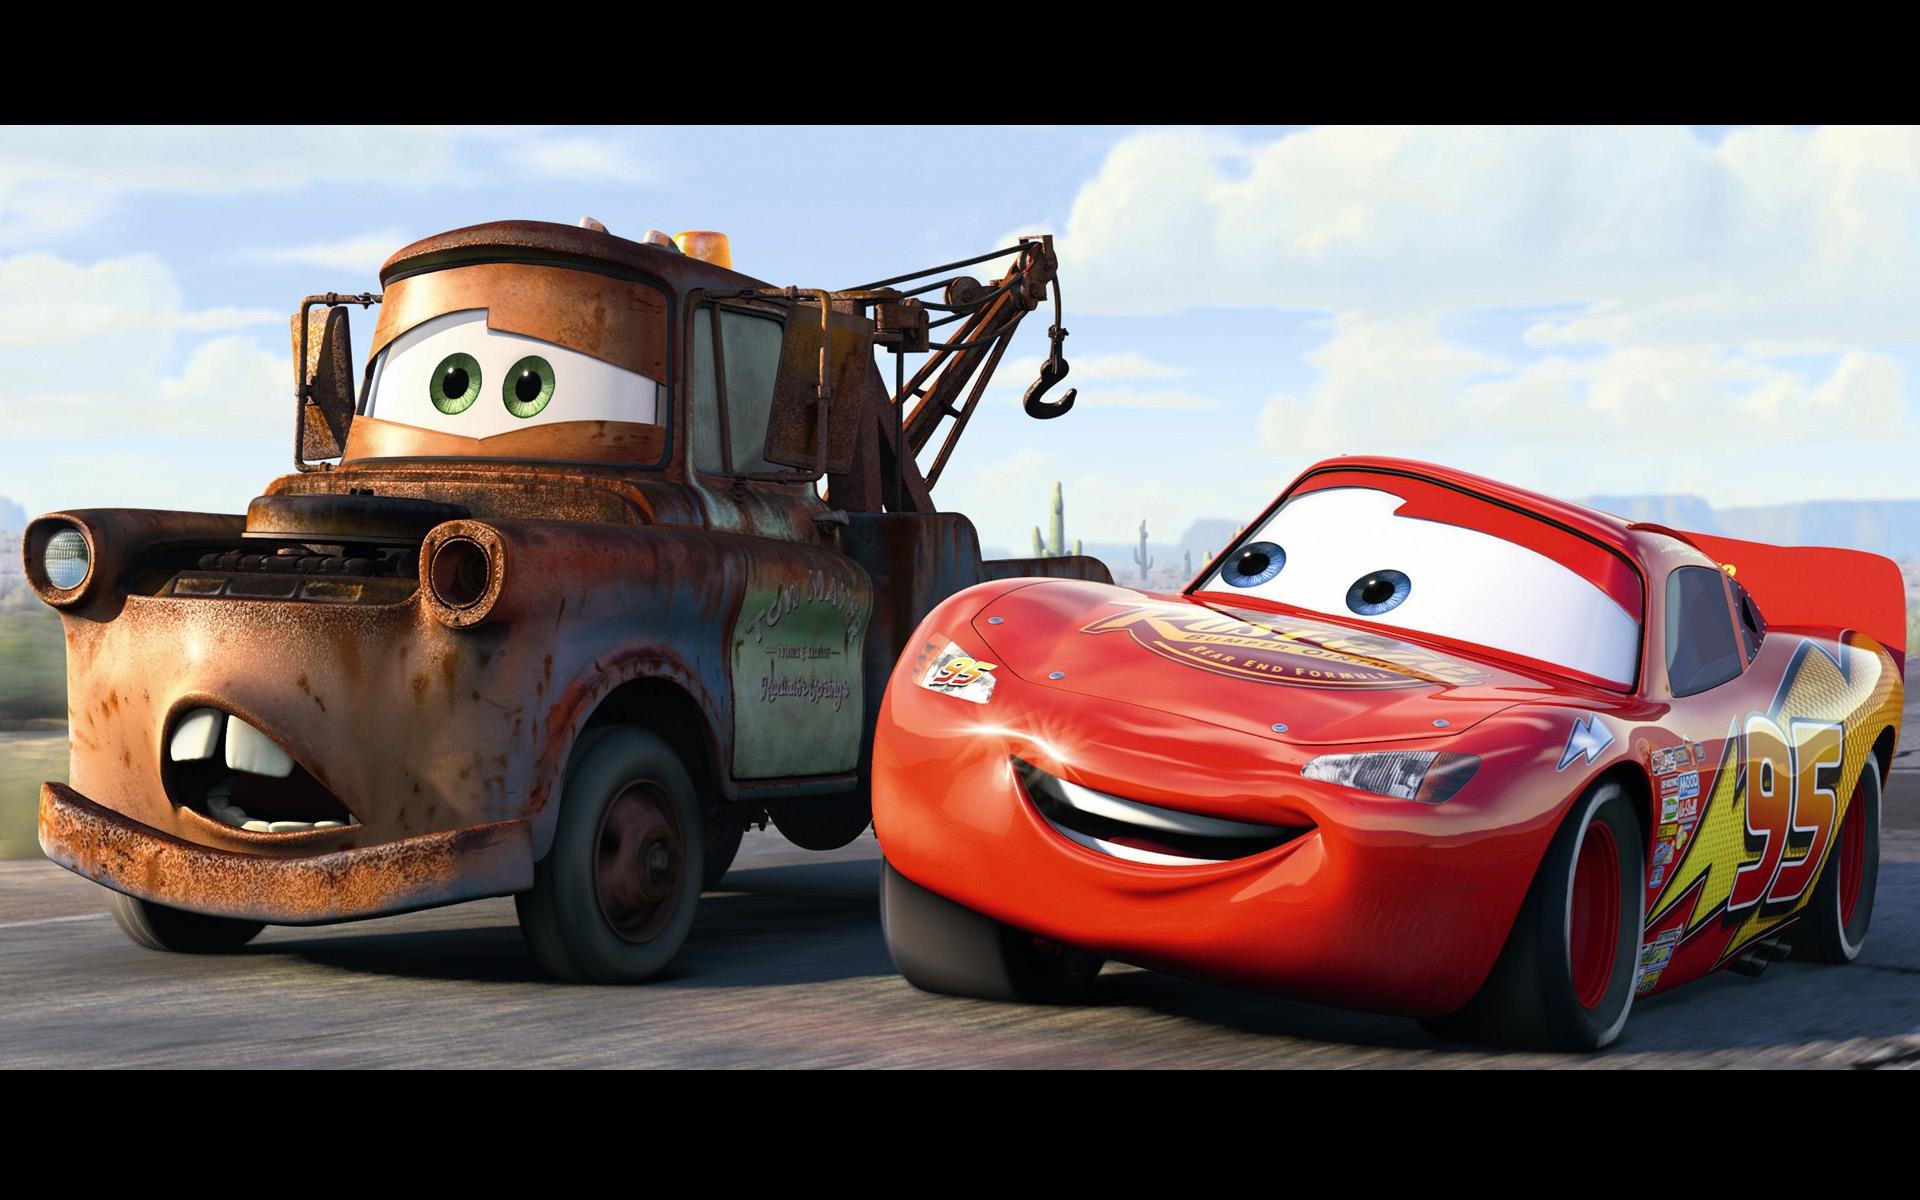 hight resolution of cars 2 cartoon wallpaper hd for desktop cartoons images